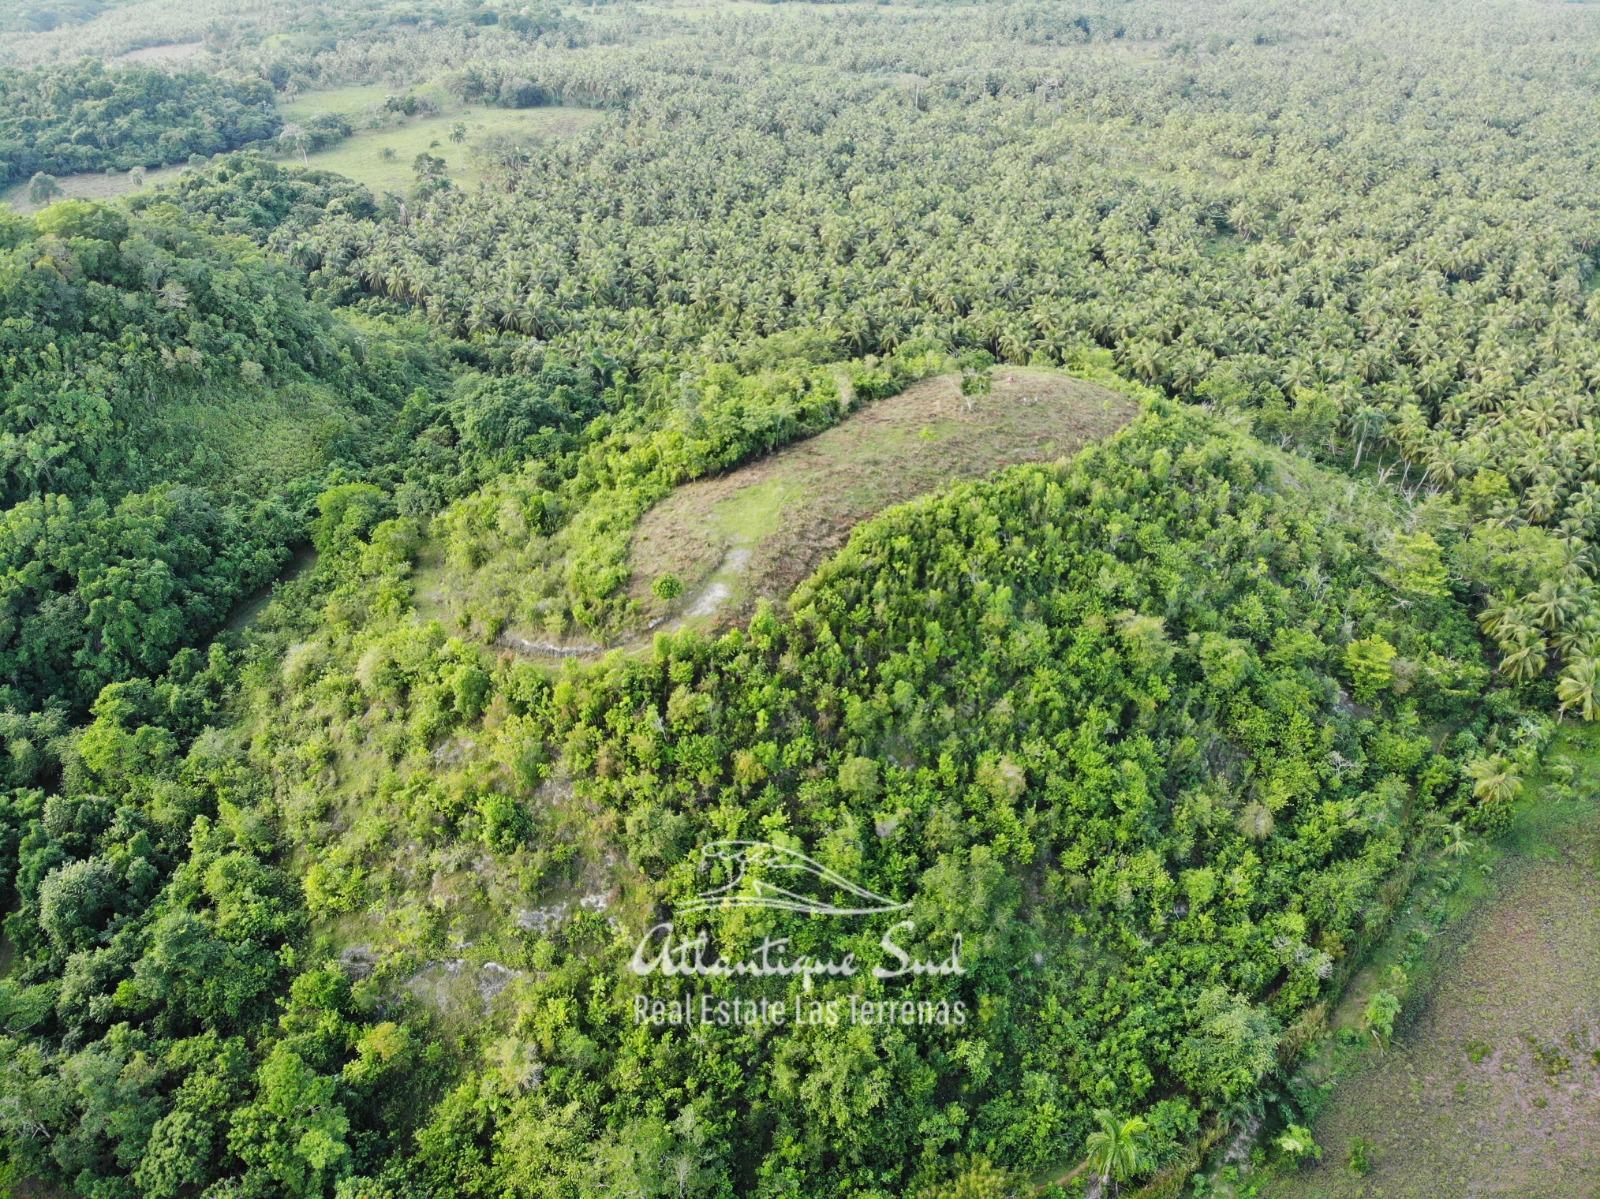 Barbacoa Land for Sale Samana 20.jpeg